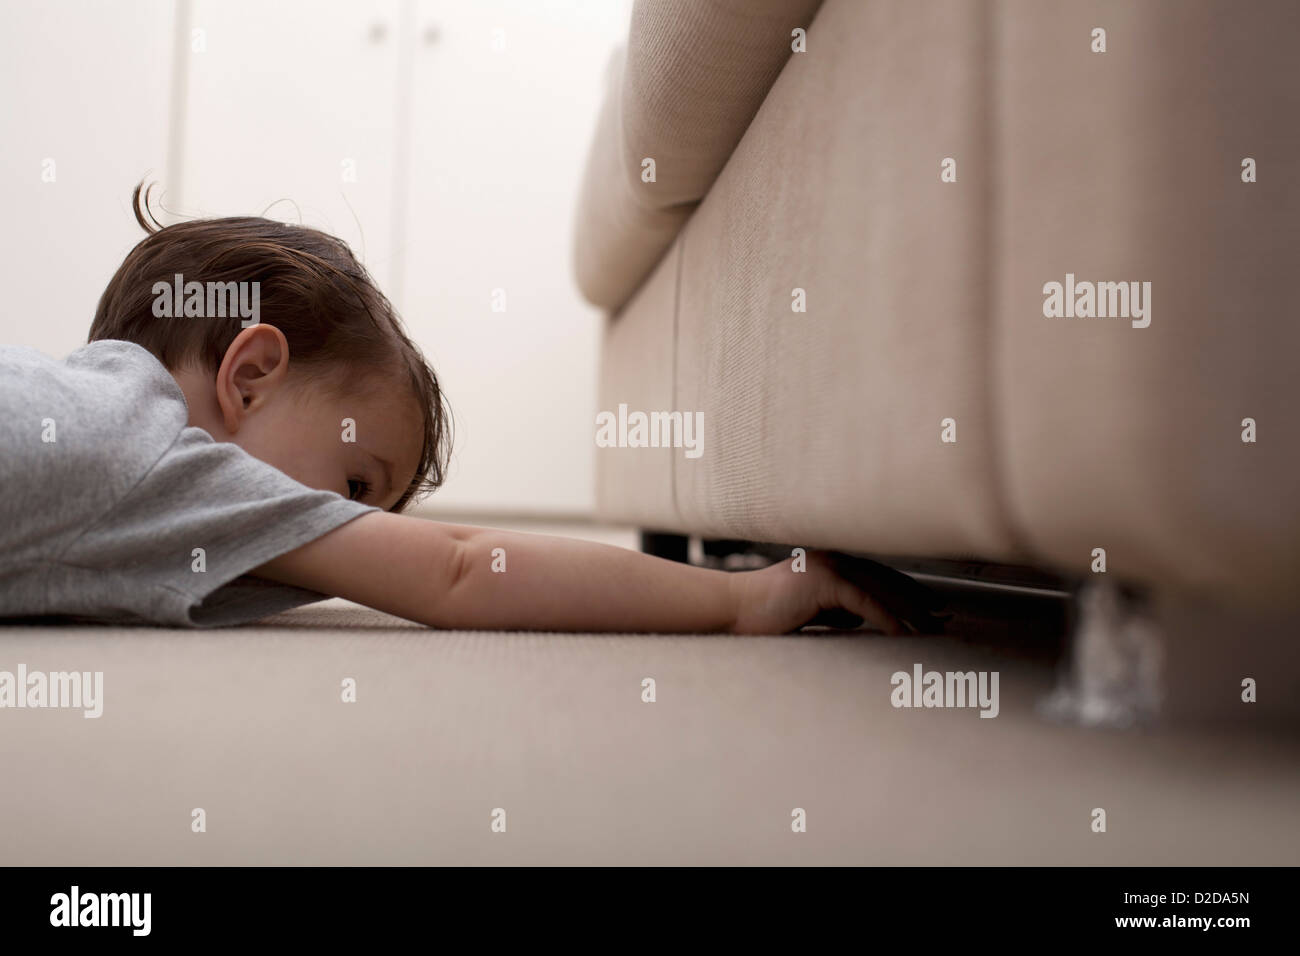 A boy reaching under a sofa to retrieve something - Stock Image